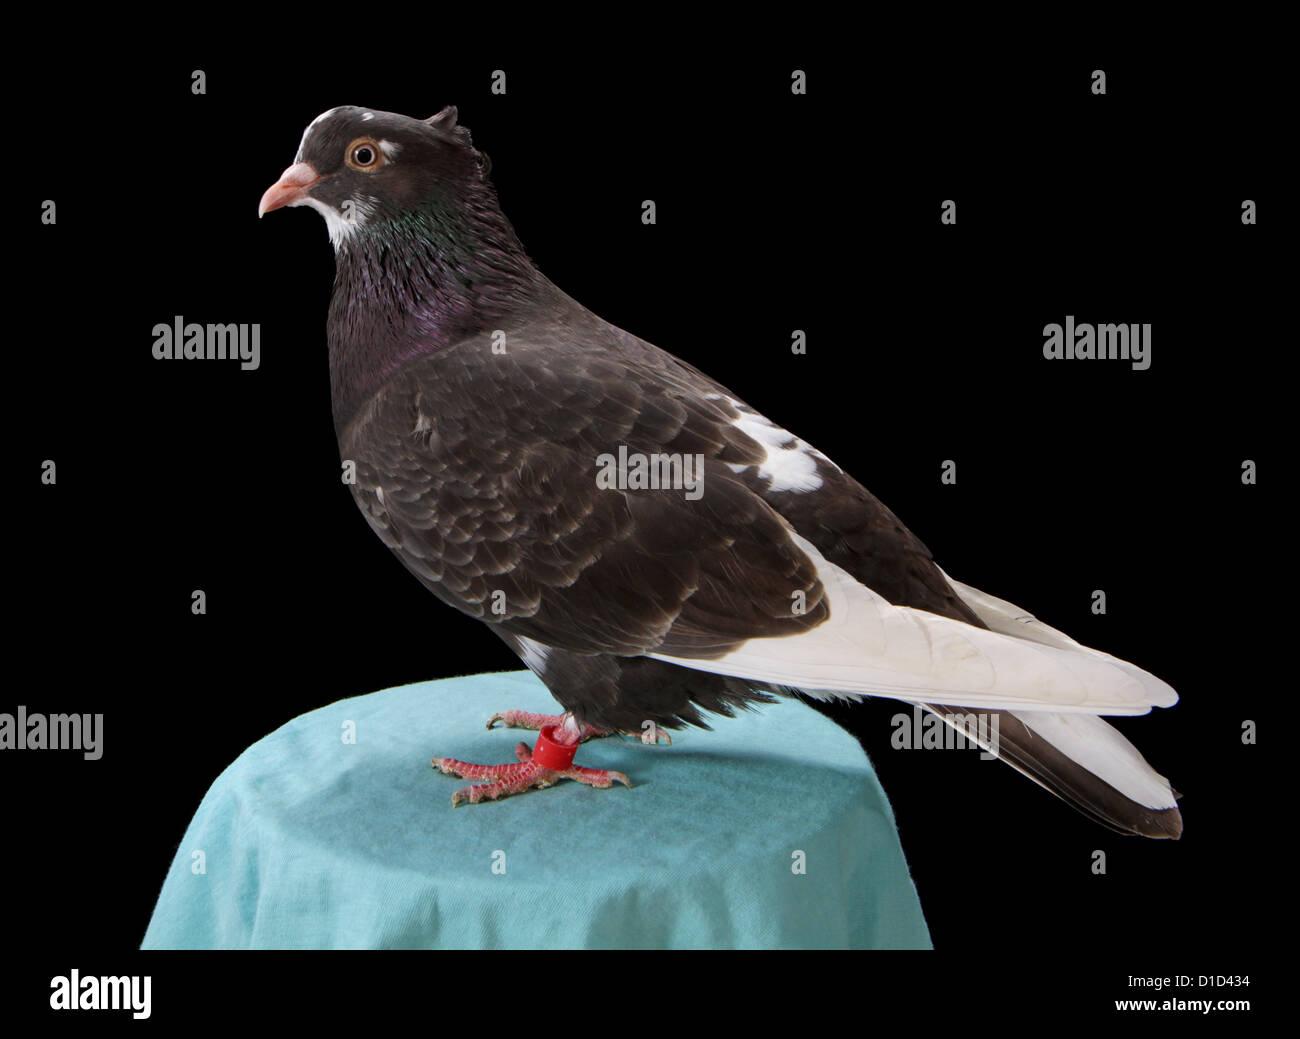 Serbian highflyer fancy pigeon on a plain black background. - Stock Image